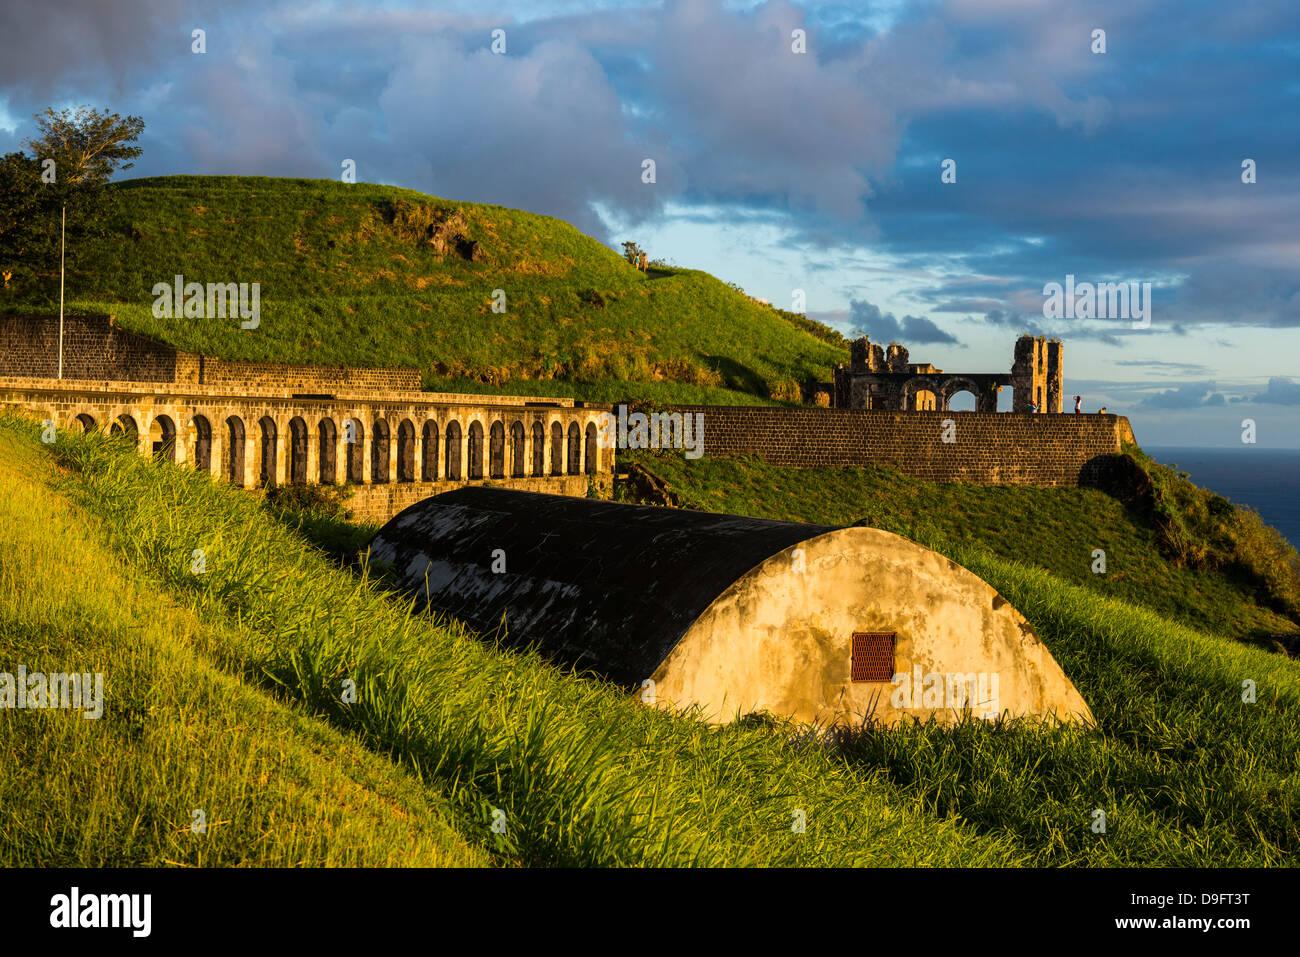 Brimstone Hill Fortress, Sito Patrimonio Mondiale dell'UNESCO, Saint Kitts, Saint Kitts e Nevis, Isole Sottovento, West Indies, dei Caraibi Foto Stock